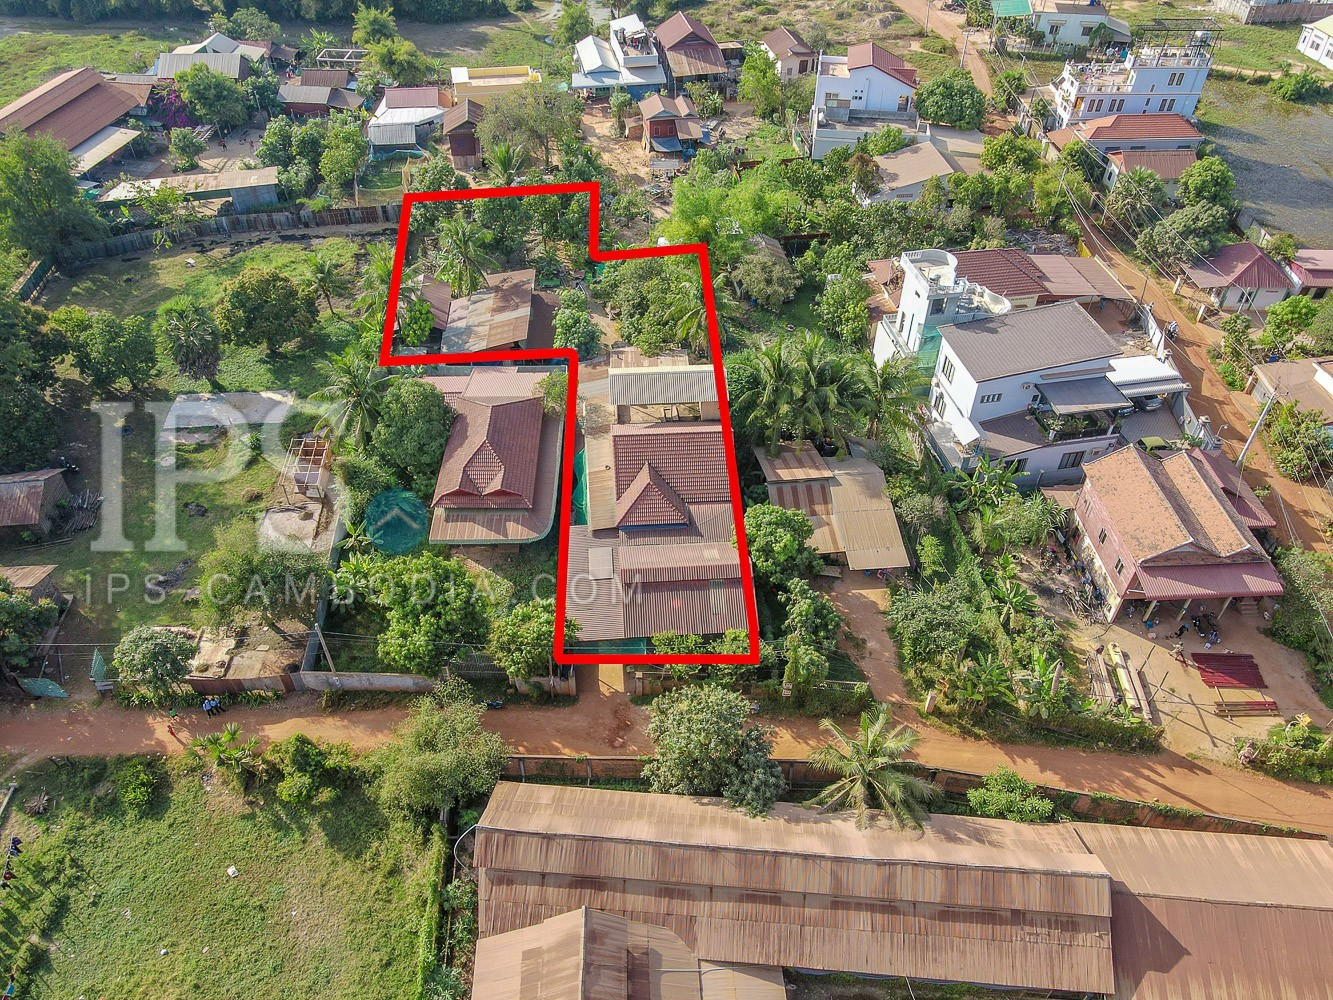 1453 Sqm Land For Sale - Sangkat Siem Reap, Siem Reap